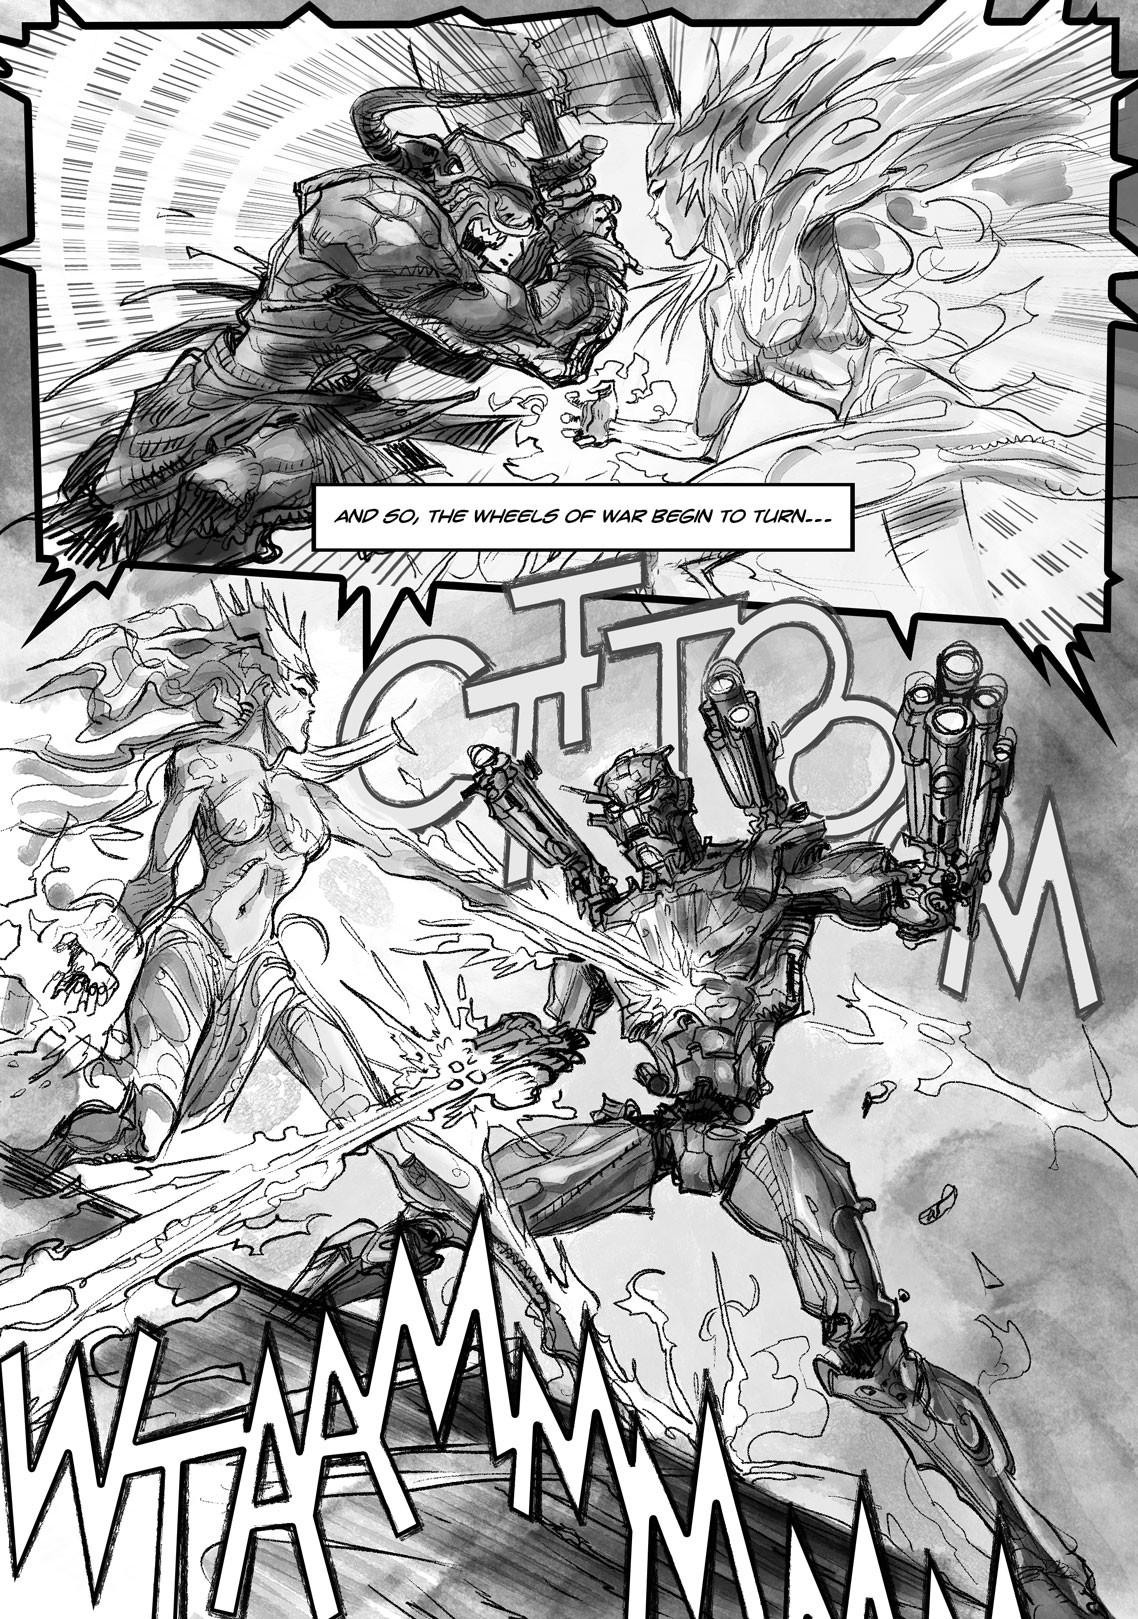 Daniele afferni 013 fight page 01